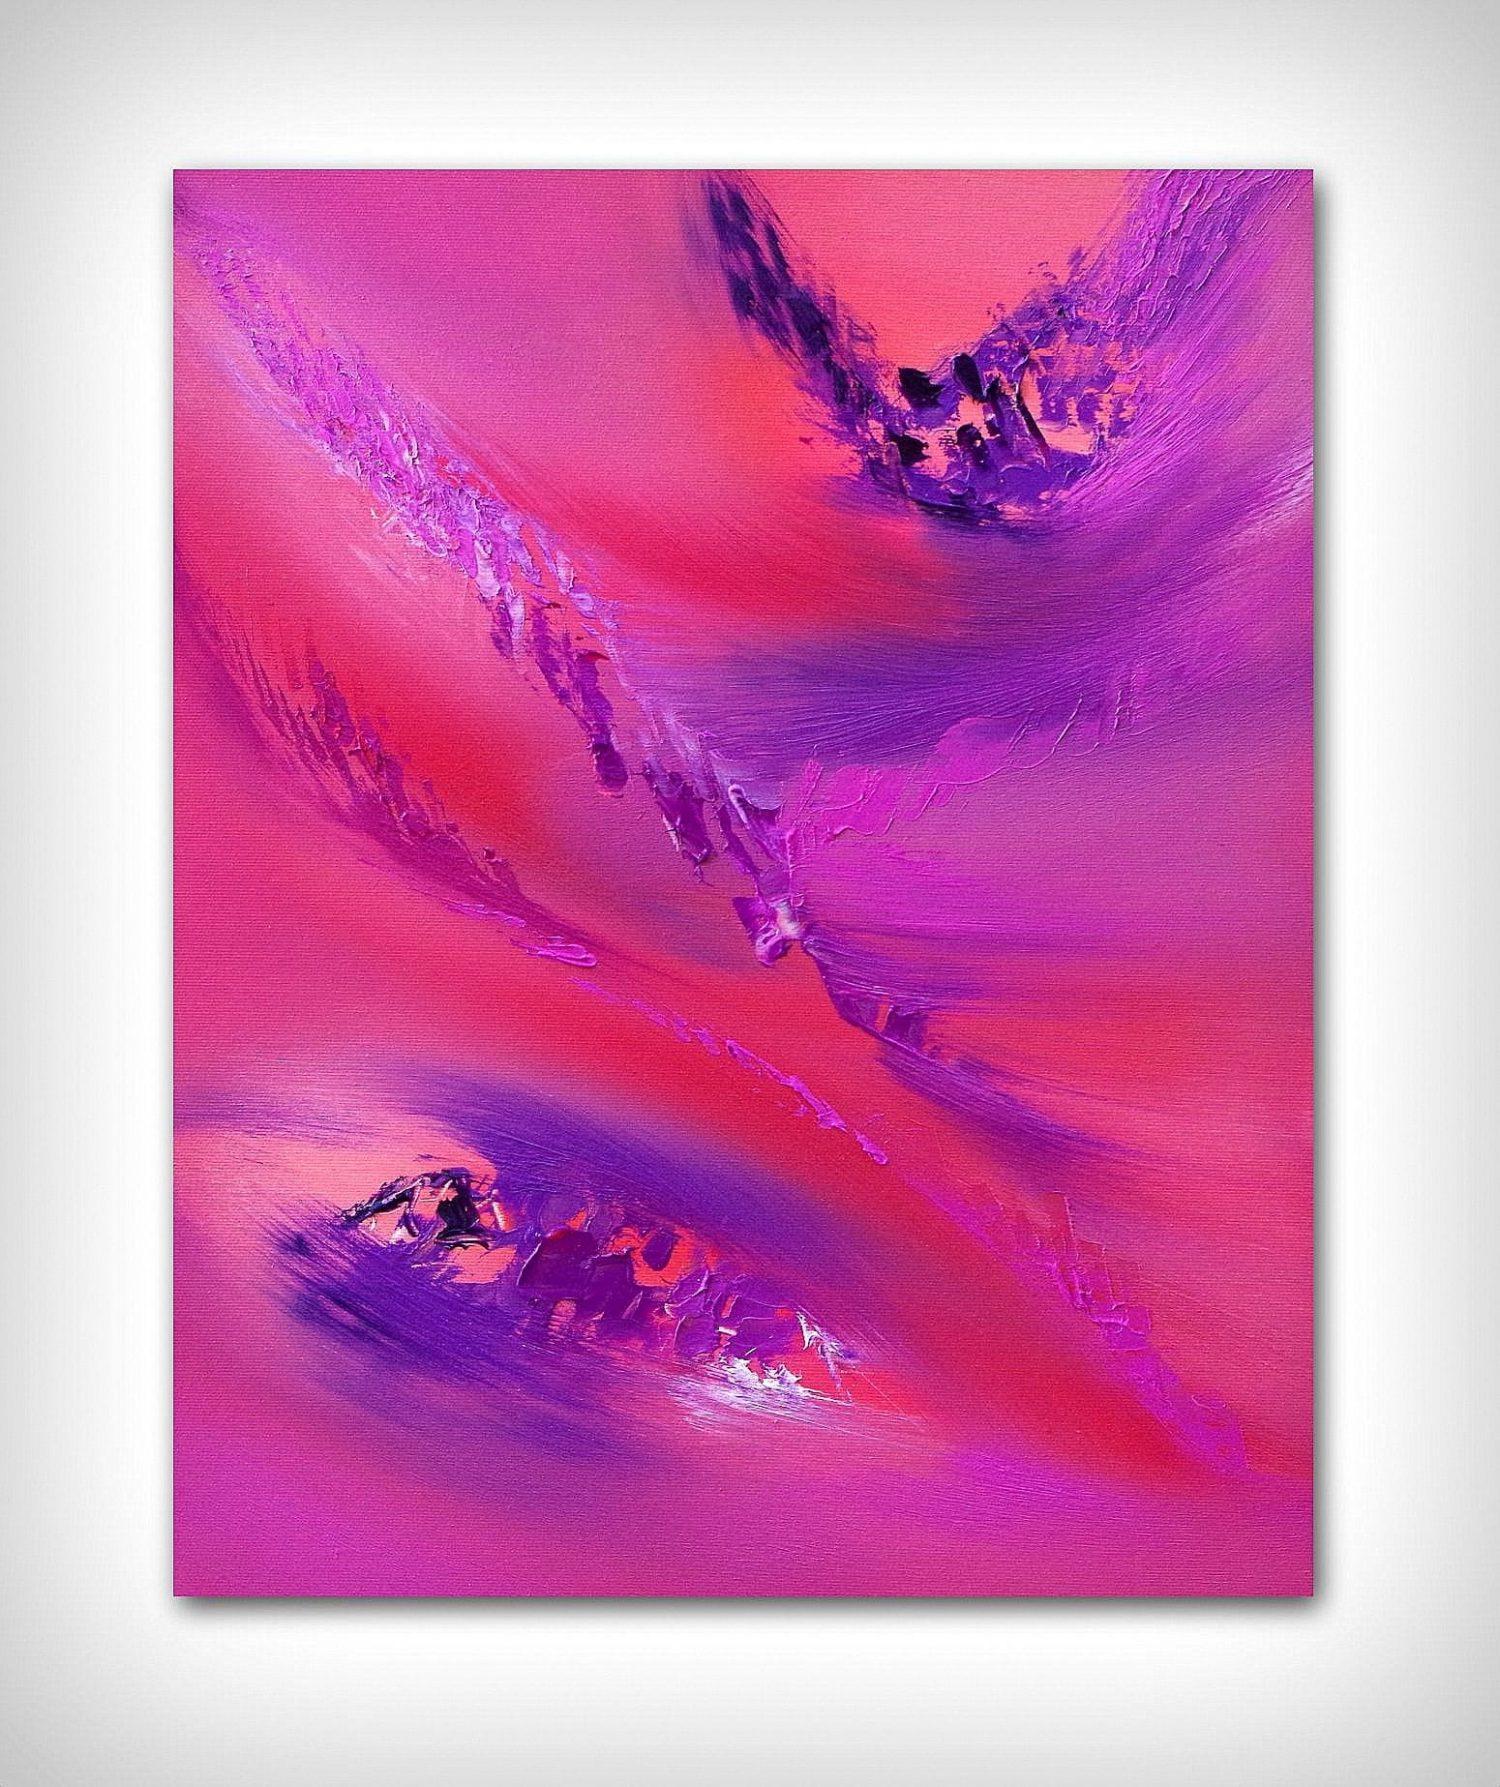 flowers 40X50 olio su tela quadro moderno